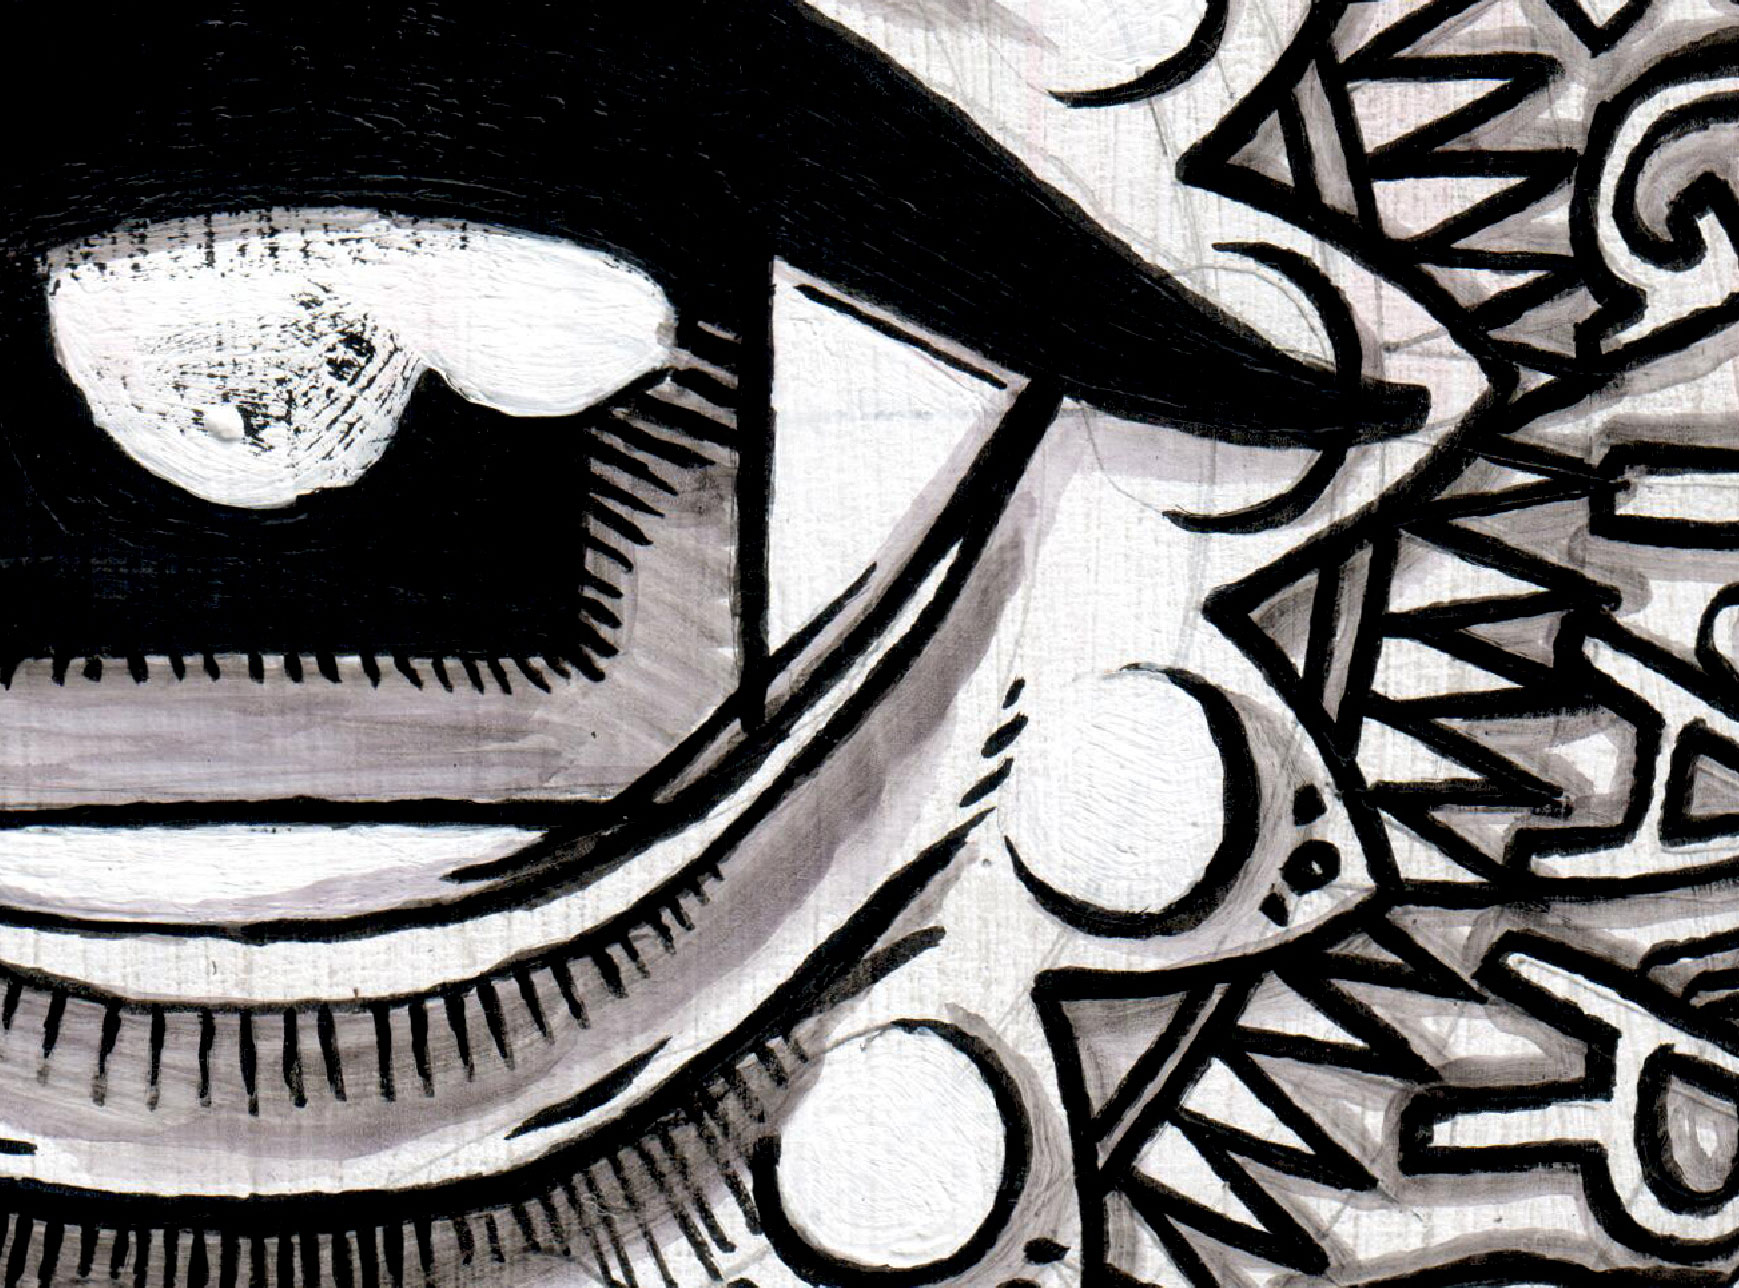 Pittacium-Painting_Detail2.jpg